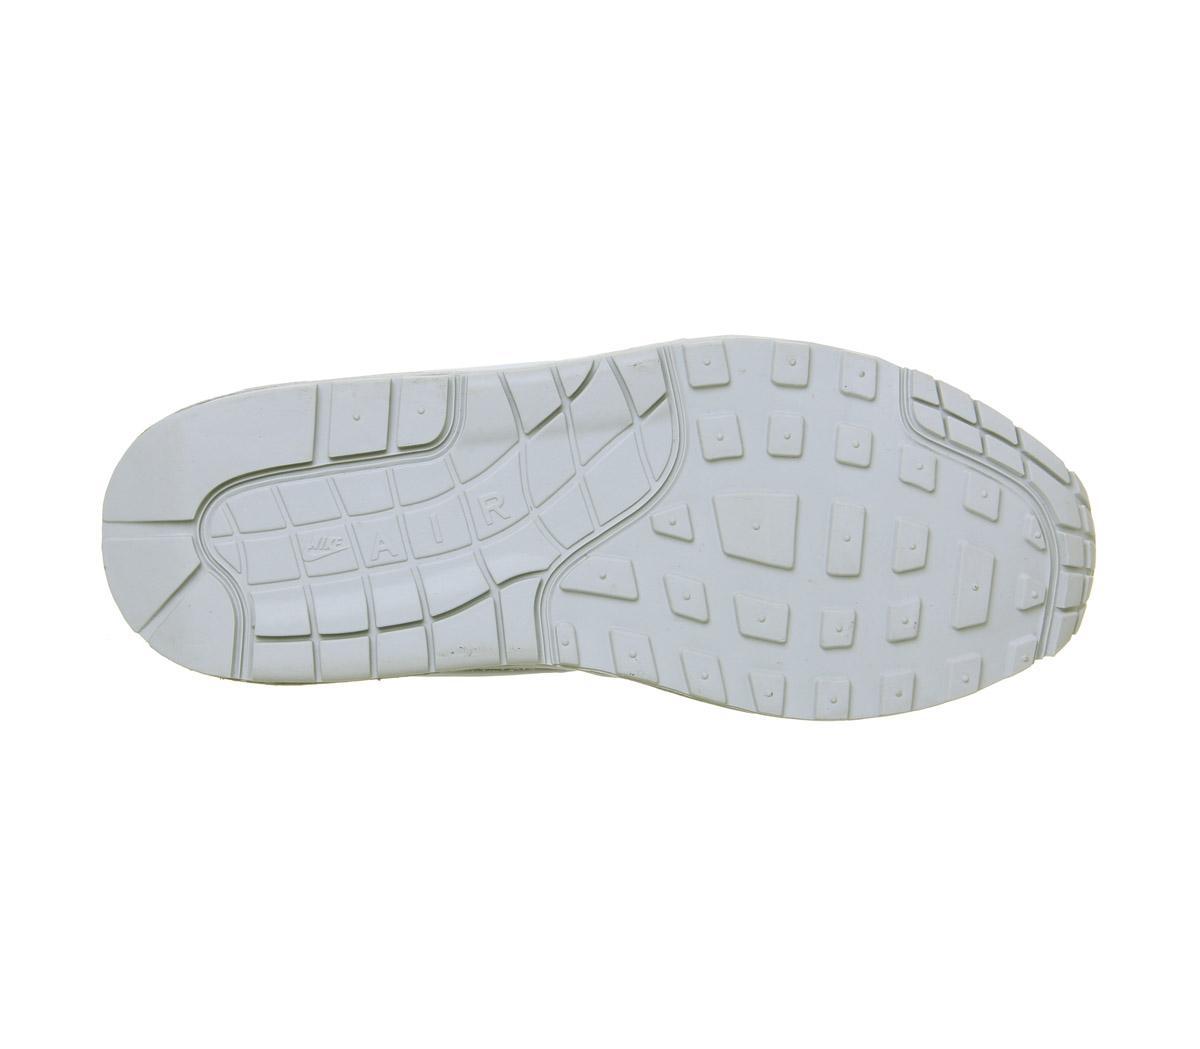 Nike Air Max 1 Pure Platinum Lx